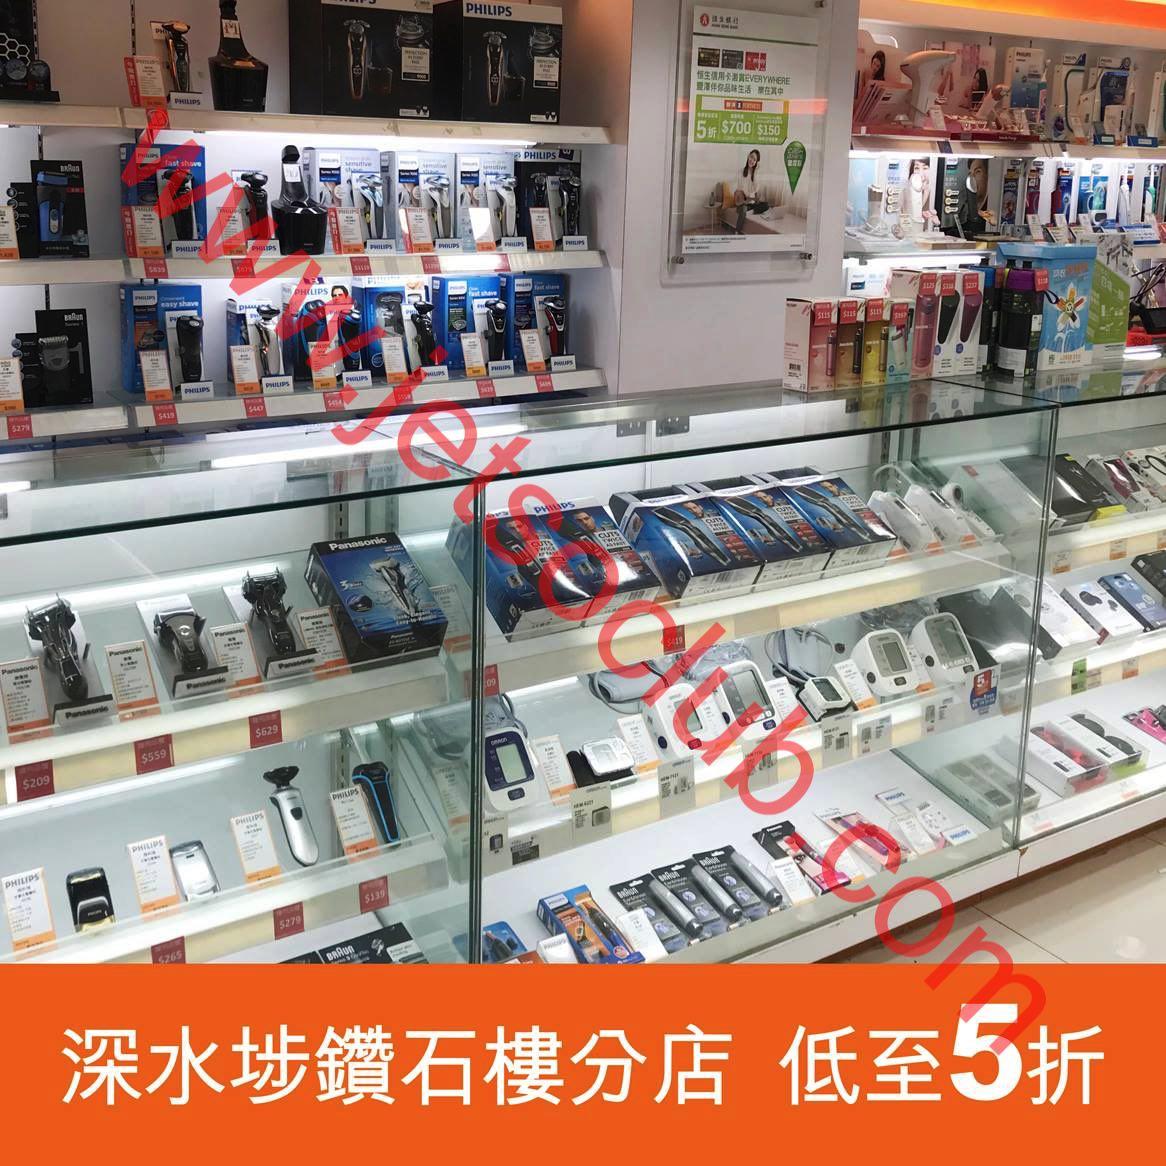 Fortress 豐澤:深水埗鑽石樓店 結業清貨 低至5折(至19/8) ( Jetso Club 著數俱樂部 )